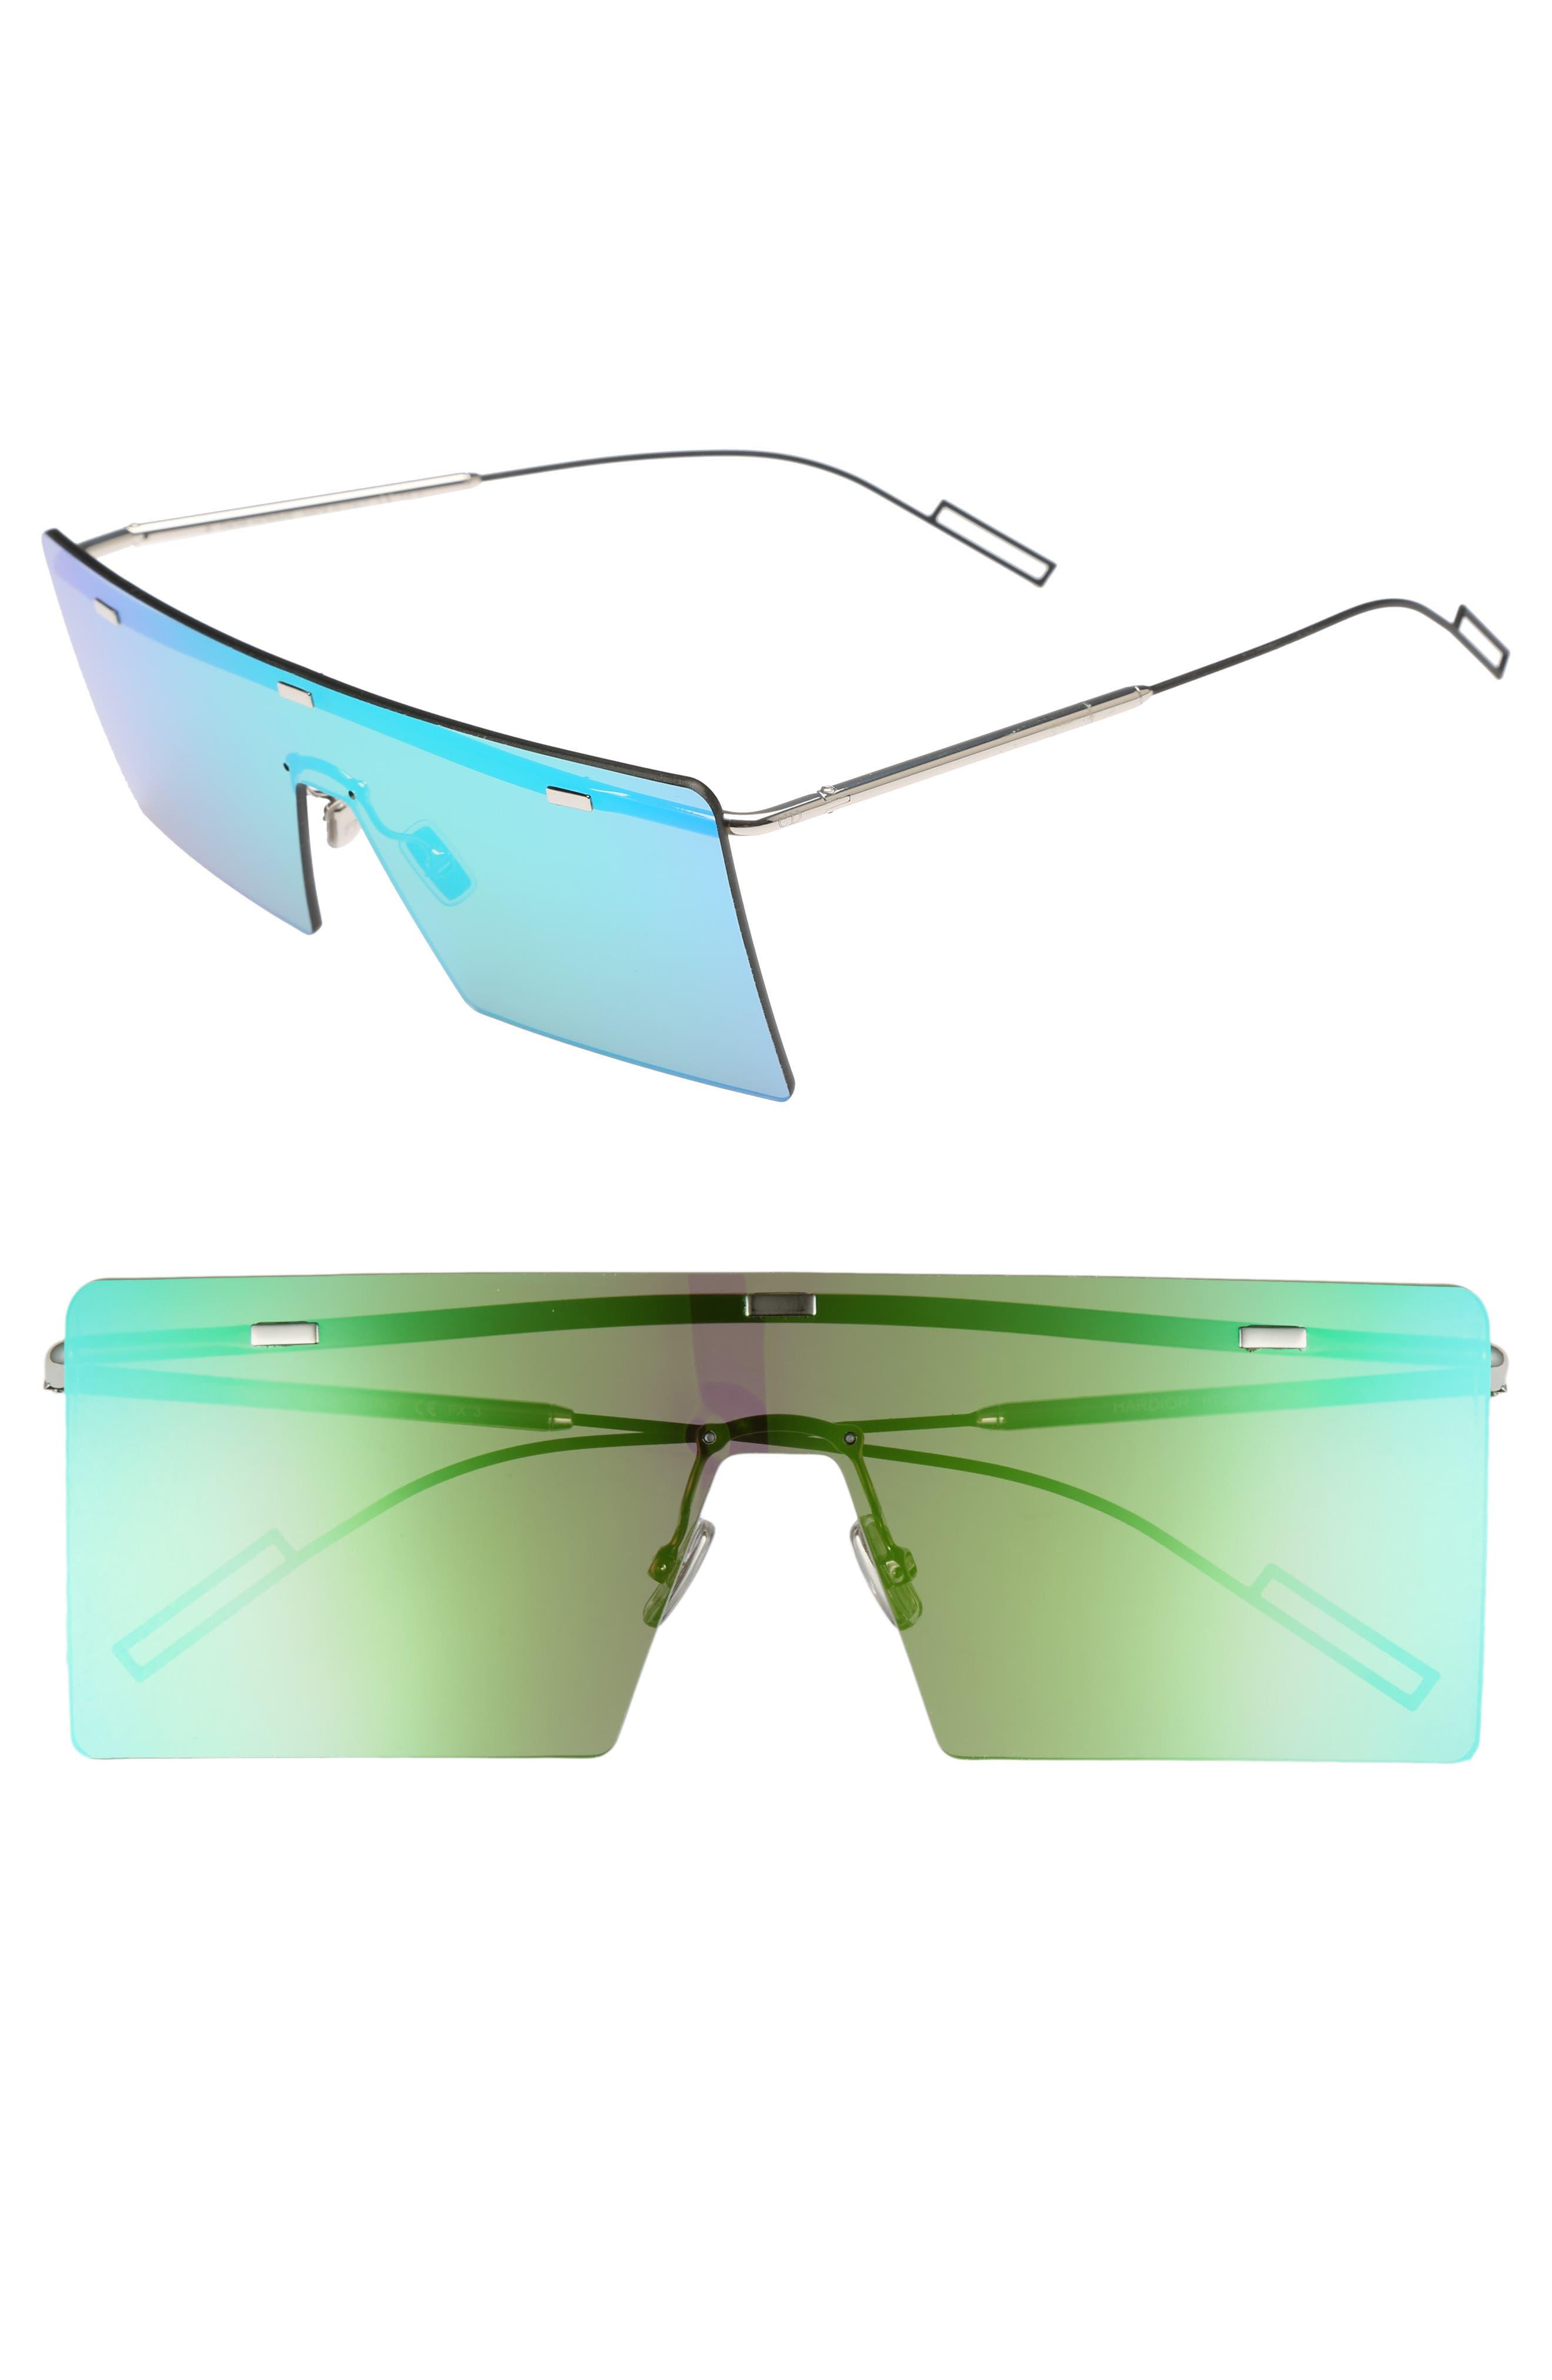 Dior Homme Hardior 65mm Sunglasses